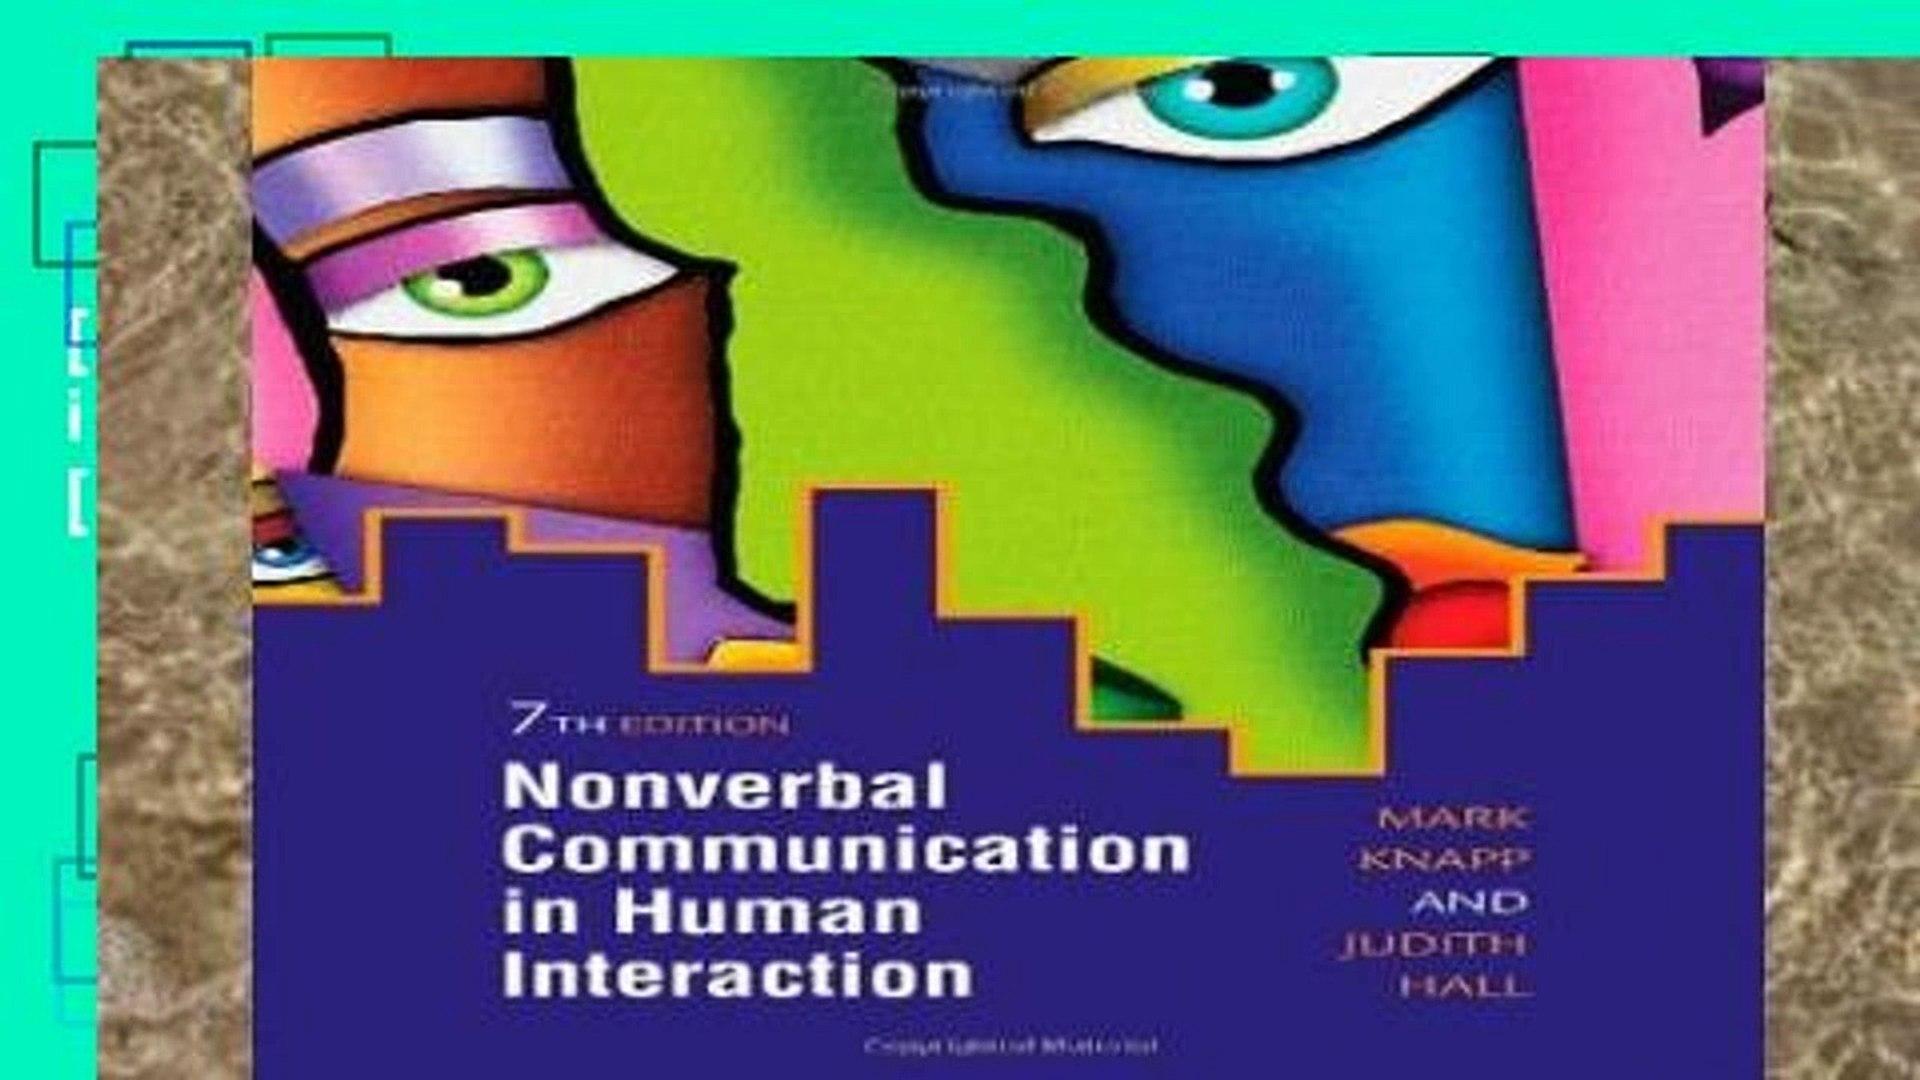 Nonverbal Communication As An Intercultural Communication